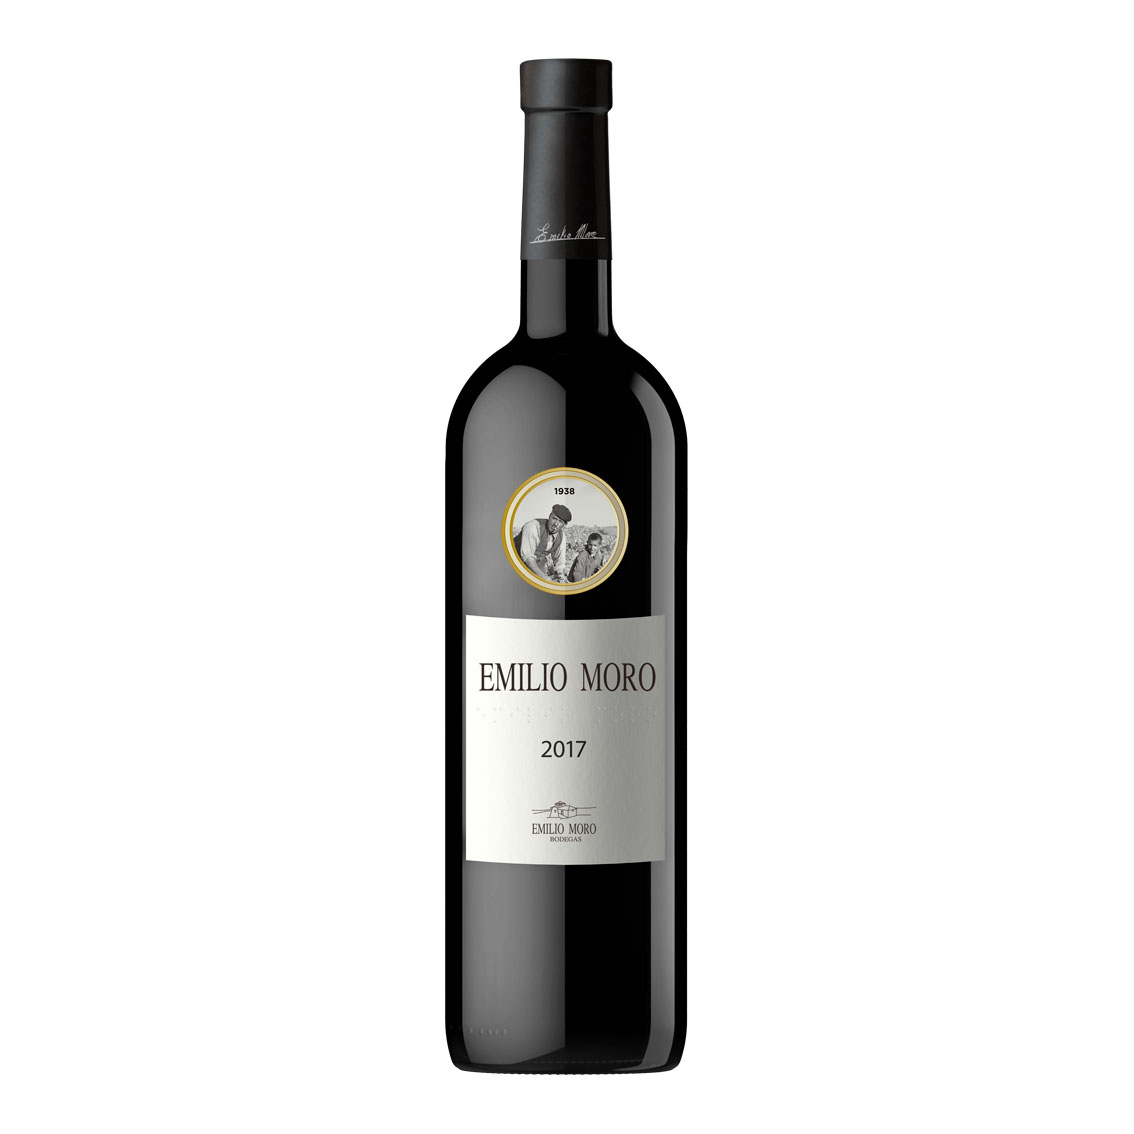 vino-emilio moro